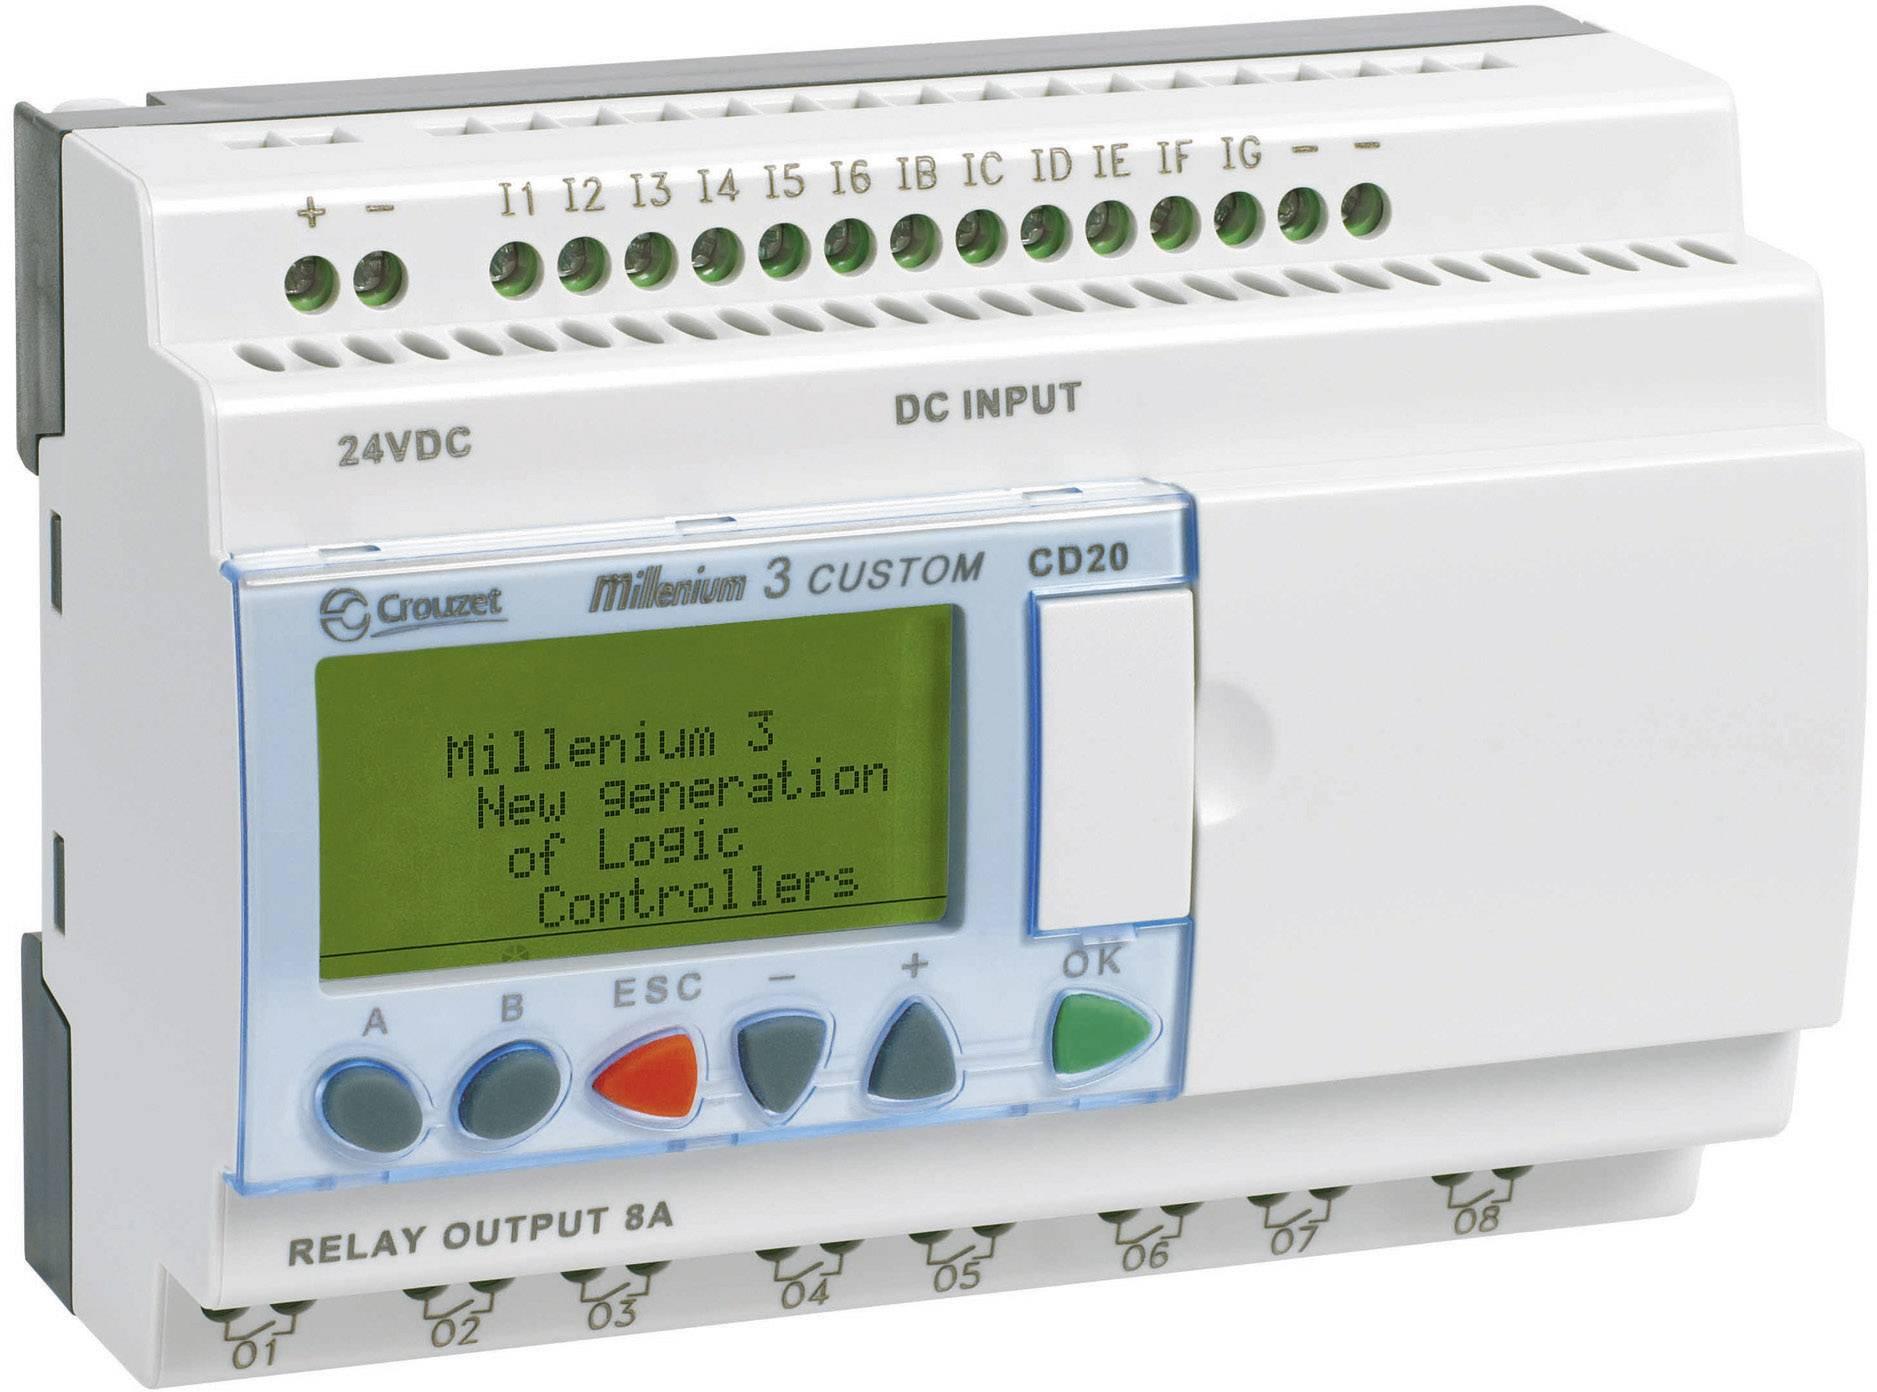 PLC řídicí modul Crouzet Millenium 3 CD20 S 88970052 24 V/DC